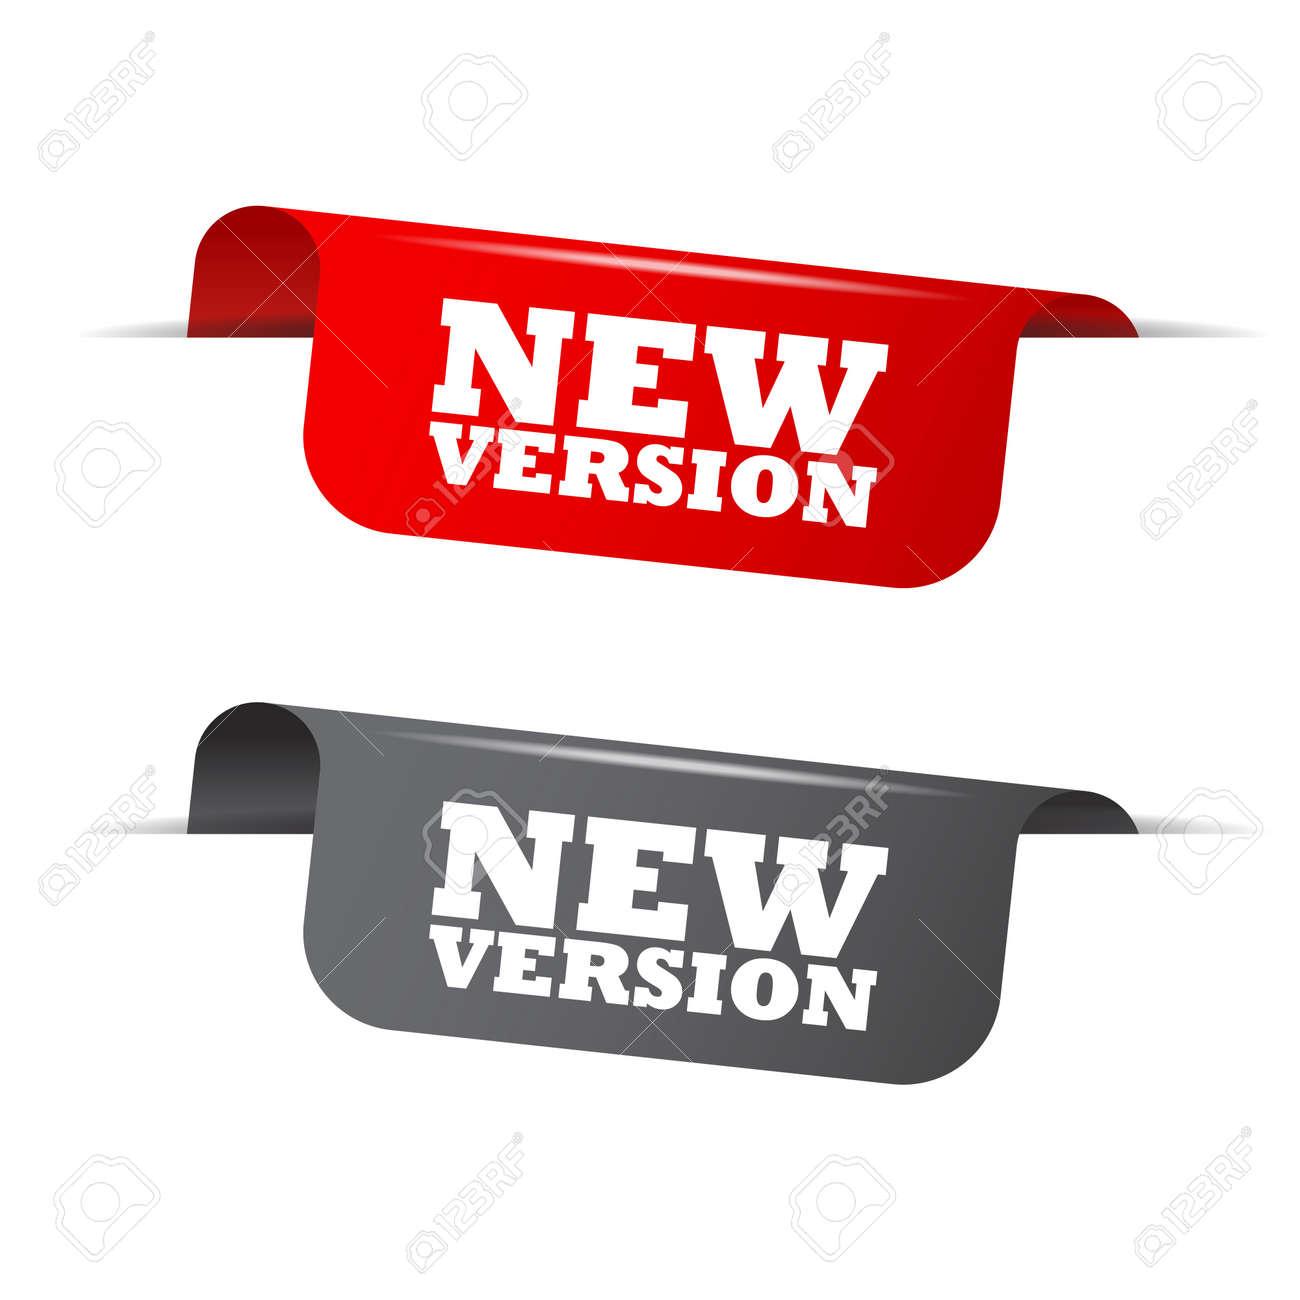 new version, element new version, red element new version, gray element new version, vector element new version, set elements new version - 59666986